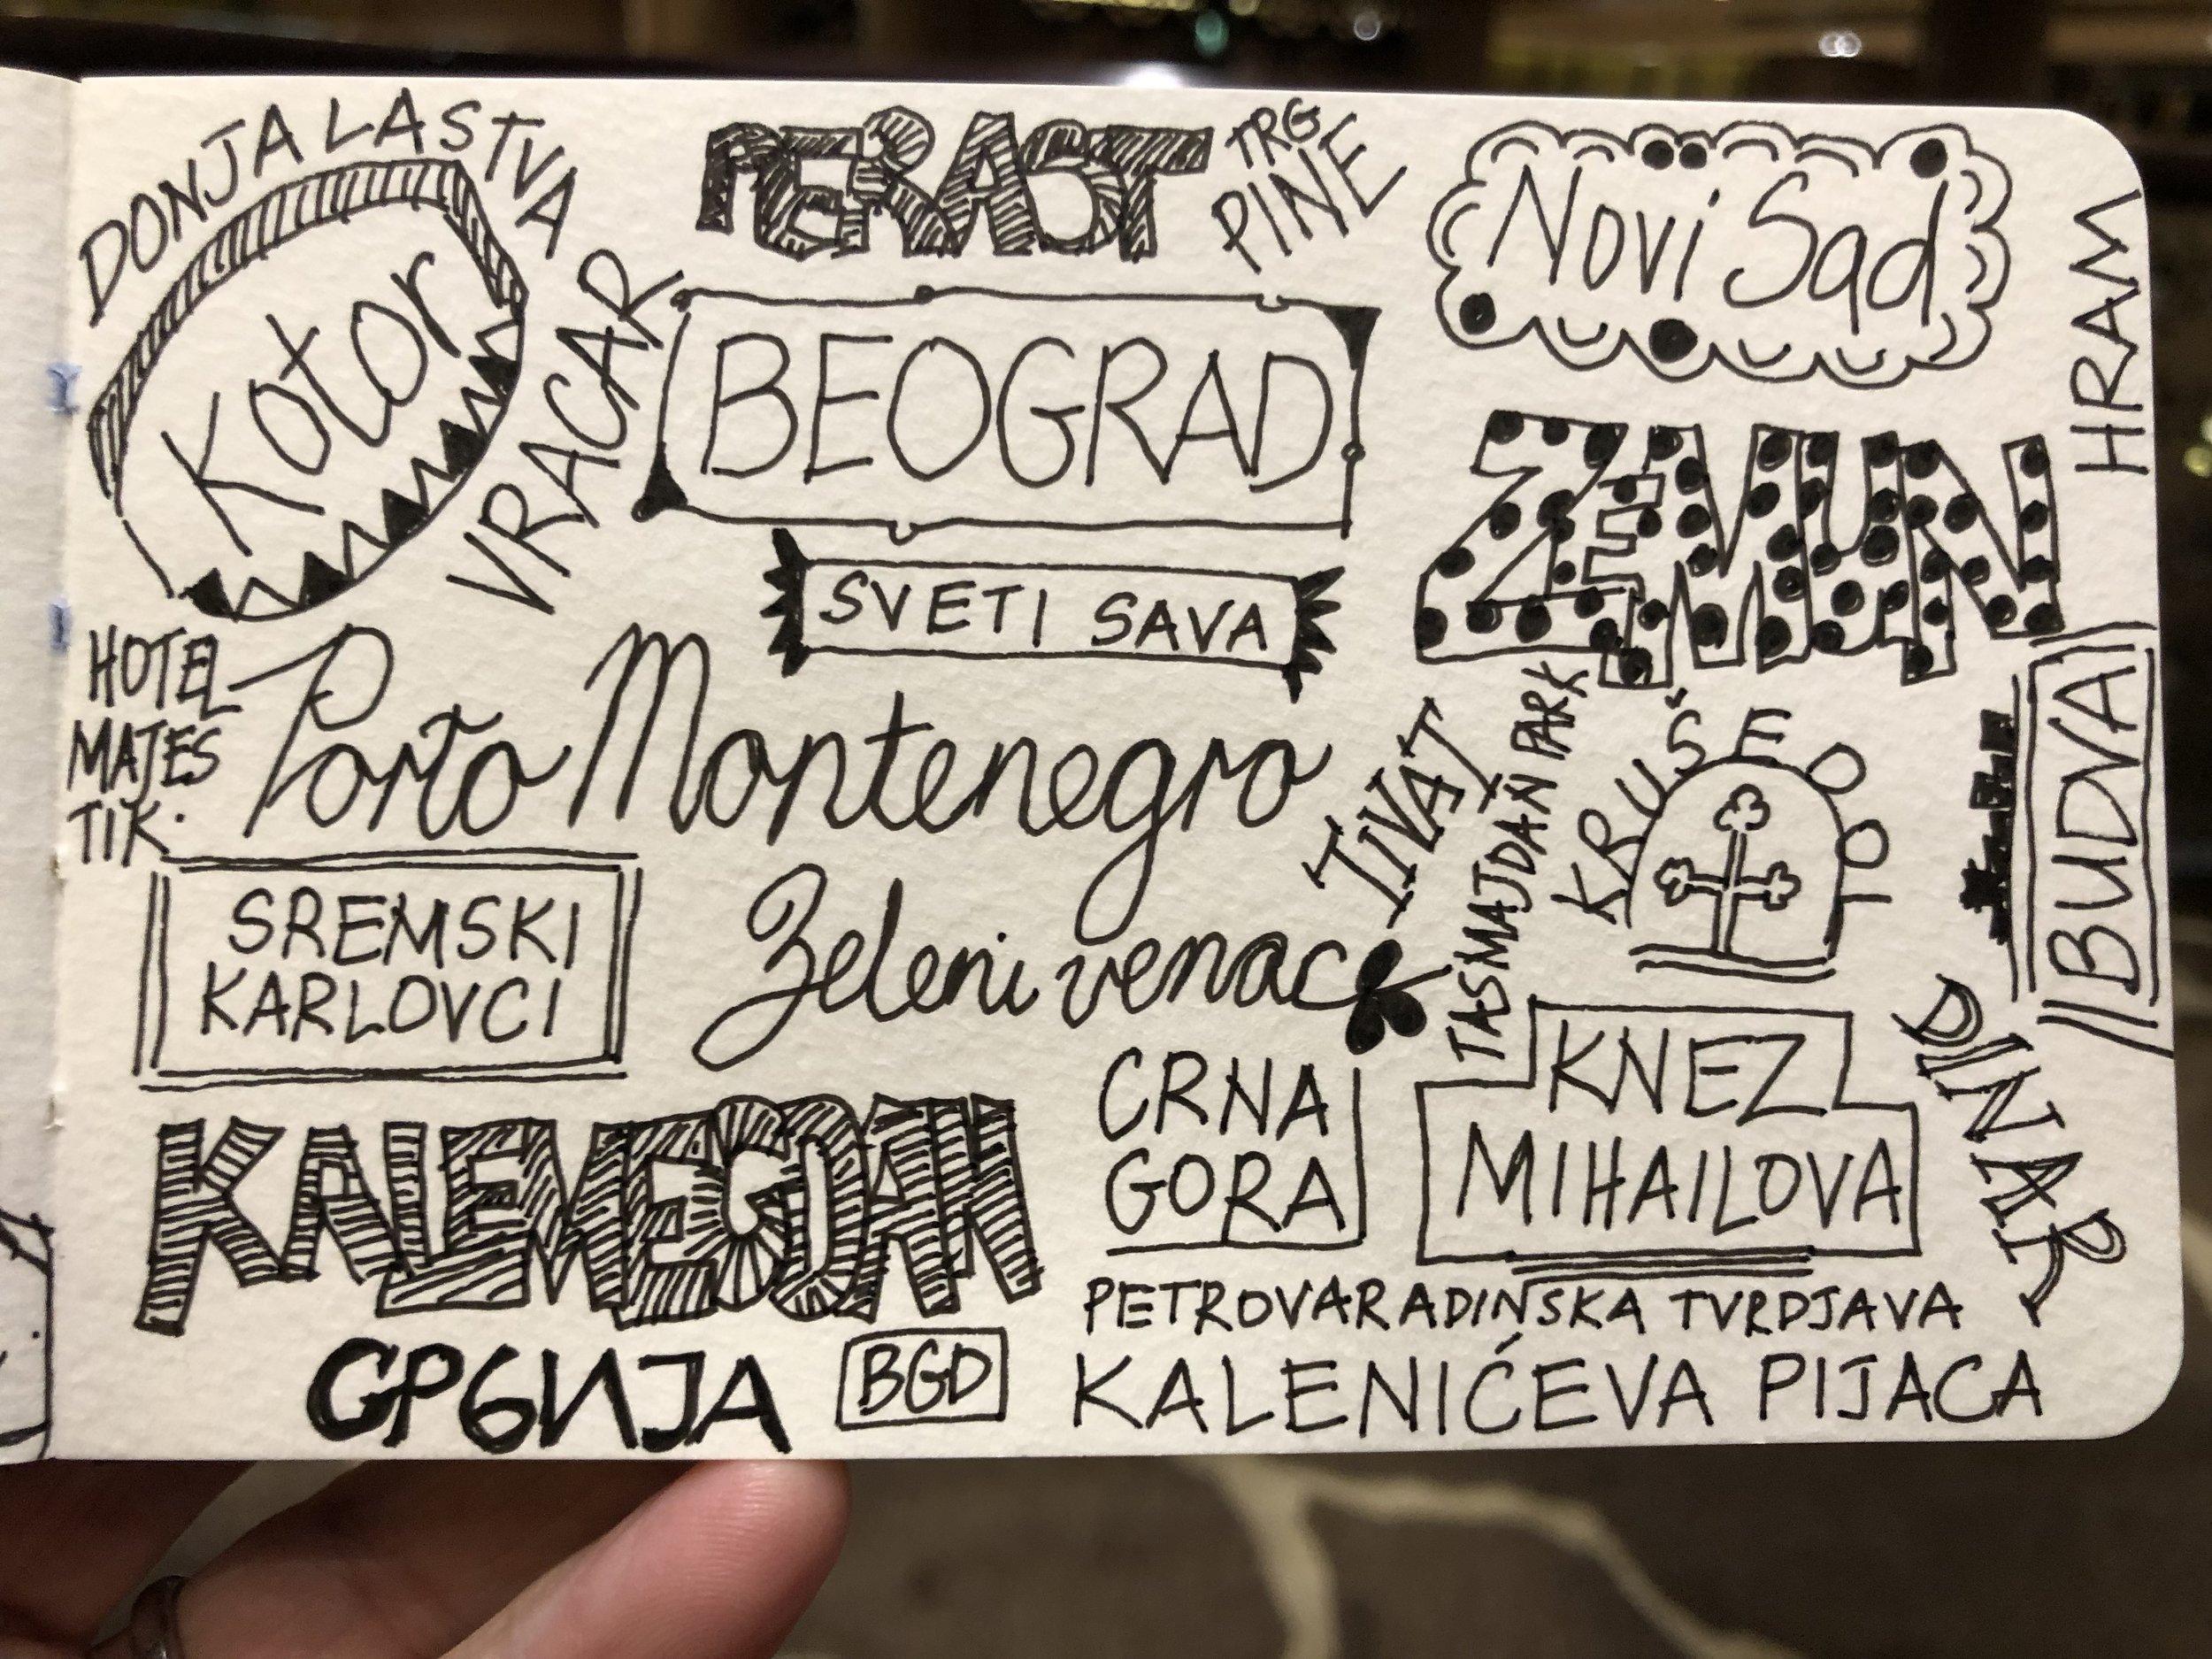 Belgrade and Montenegro: names and words